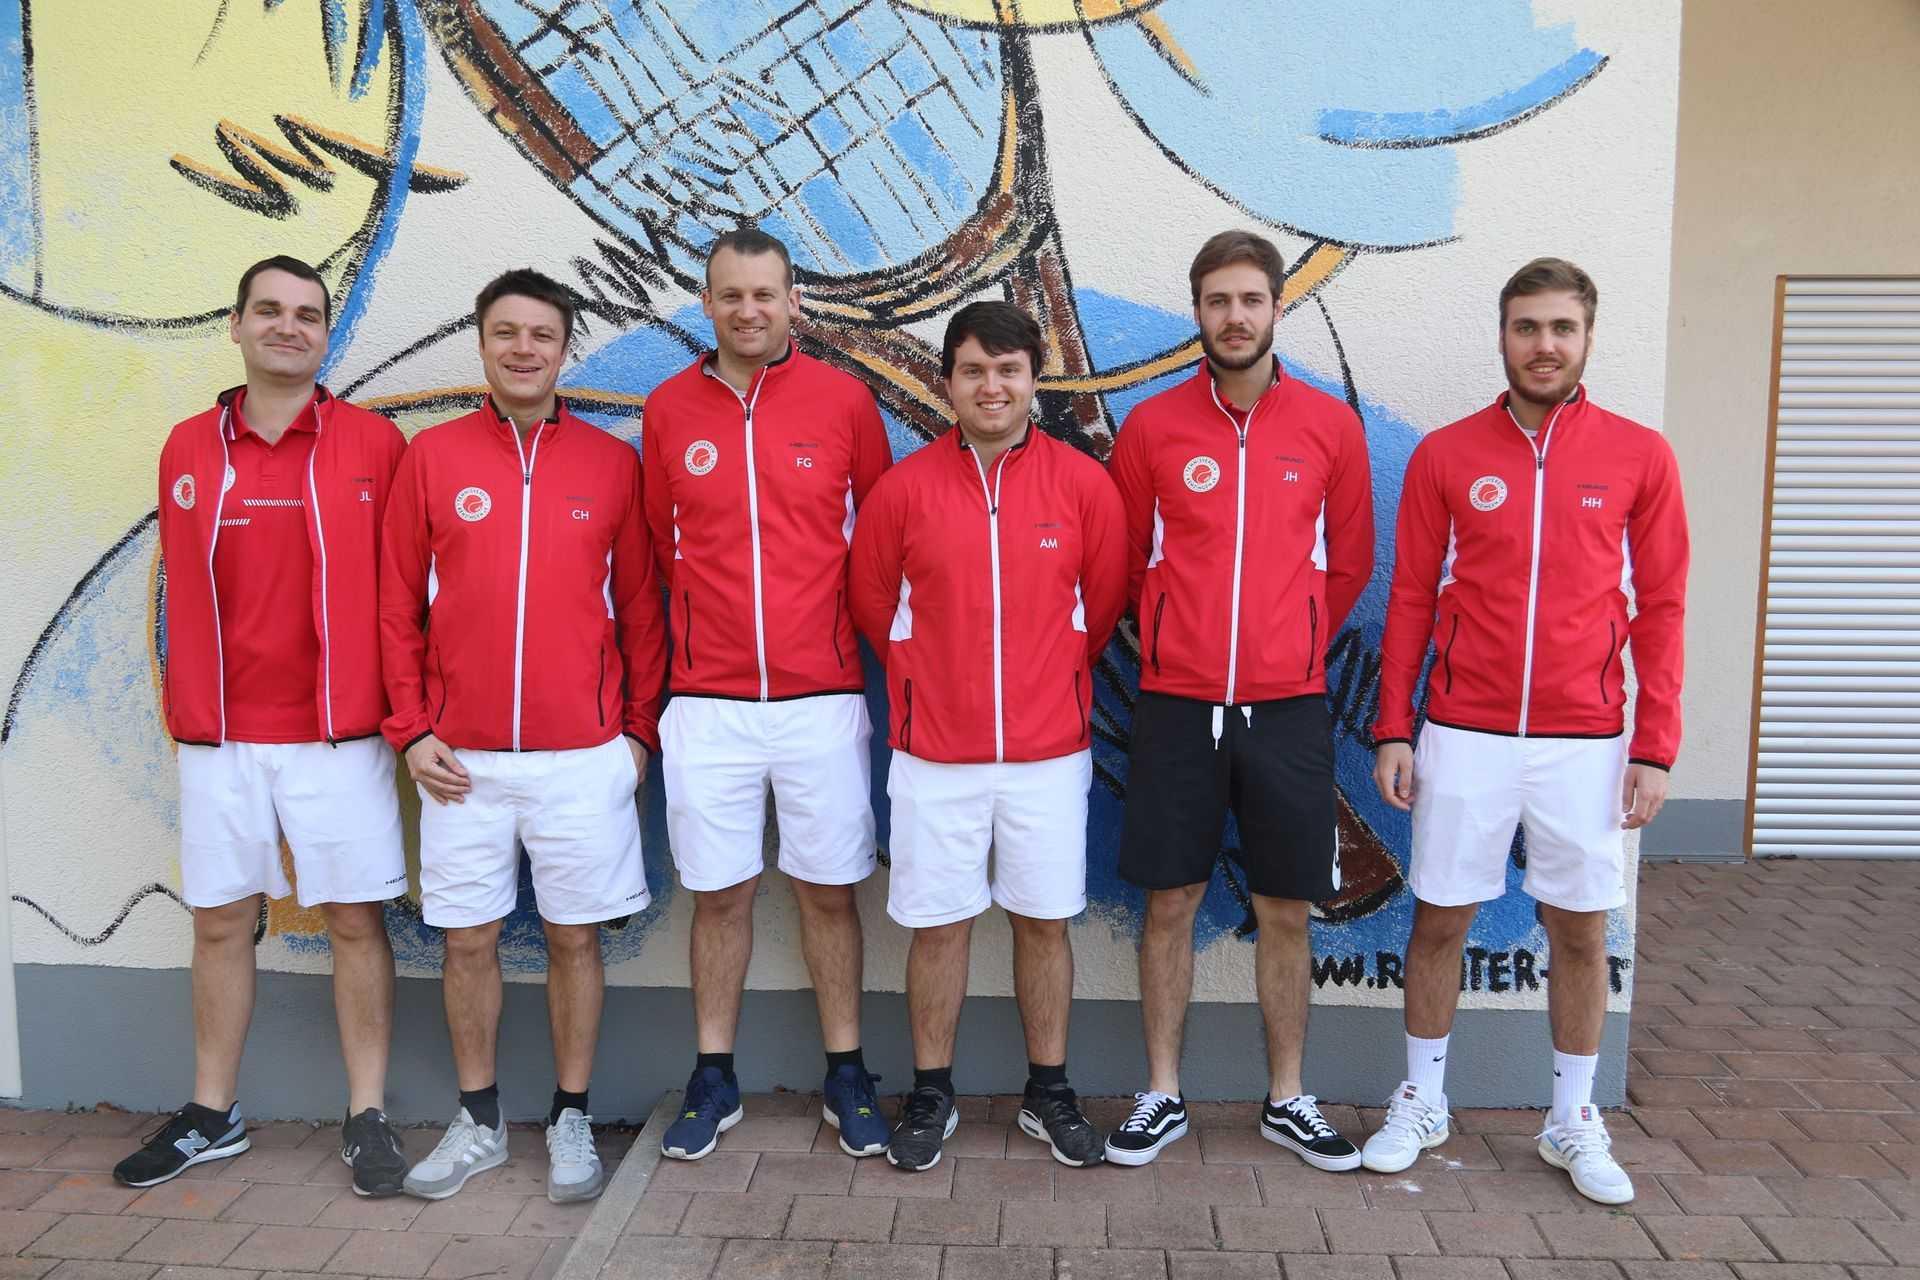 Tennisverein Kenzingen manschafte 29